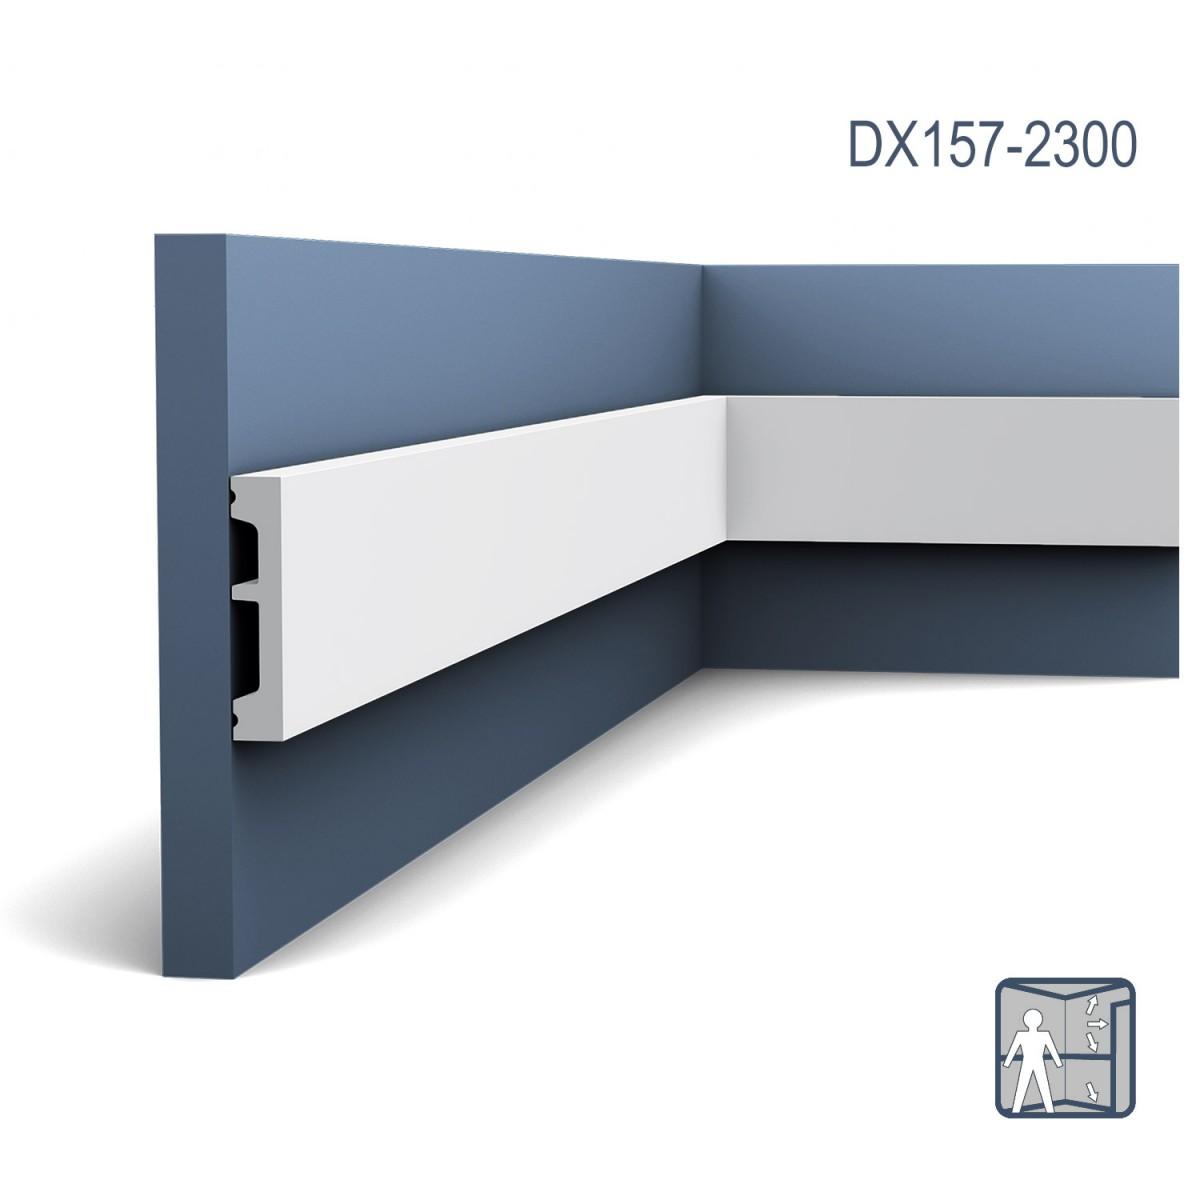 Plinta Axxent SX157, Dimensiuni: 200 X 6.6 X 1.3 cm, Orac Decor